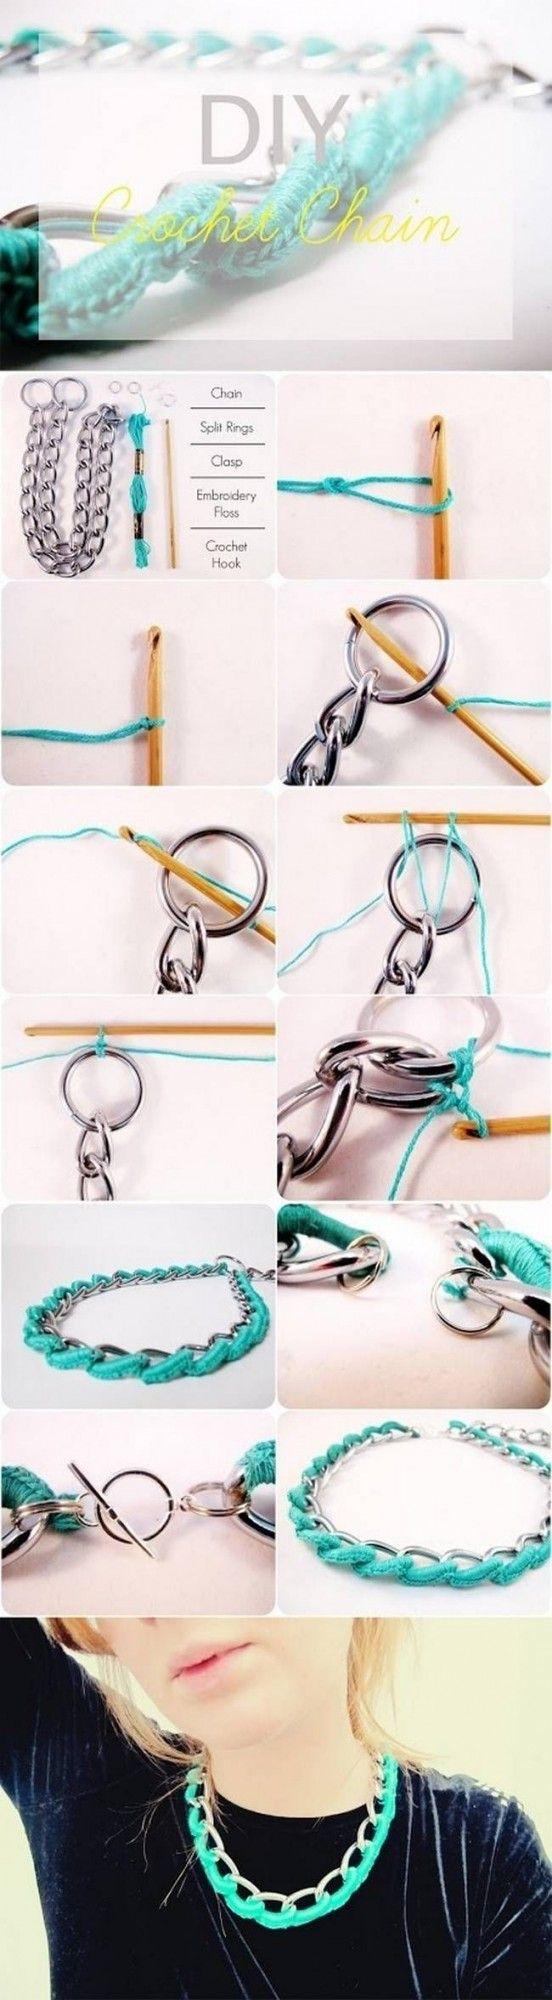 25 Gorgeous DIY Necklaces Tutorials